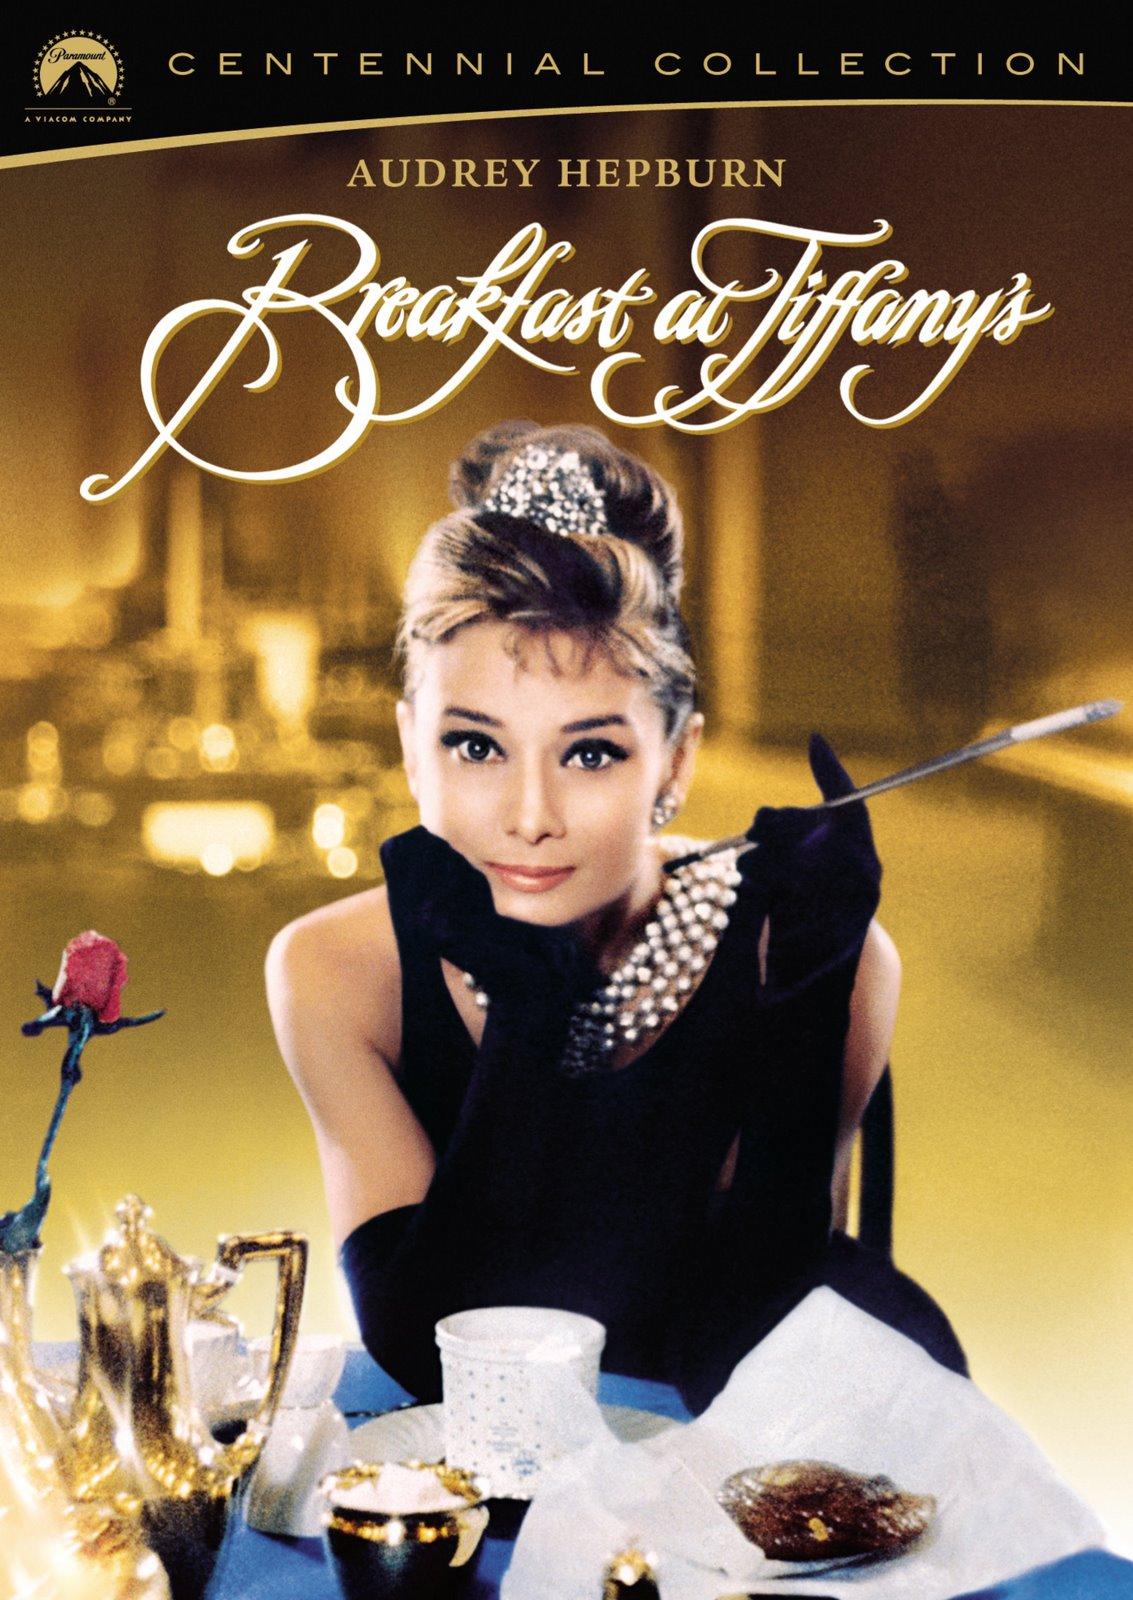 Завтрак у Тиффани (1961) (Breakfast at Tiffany's)